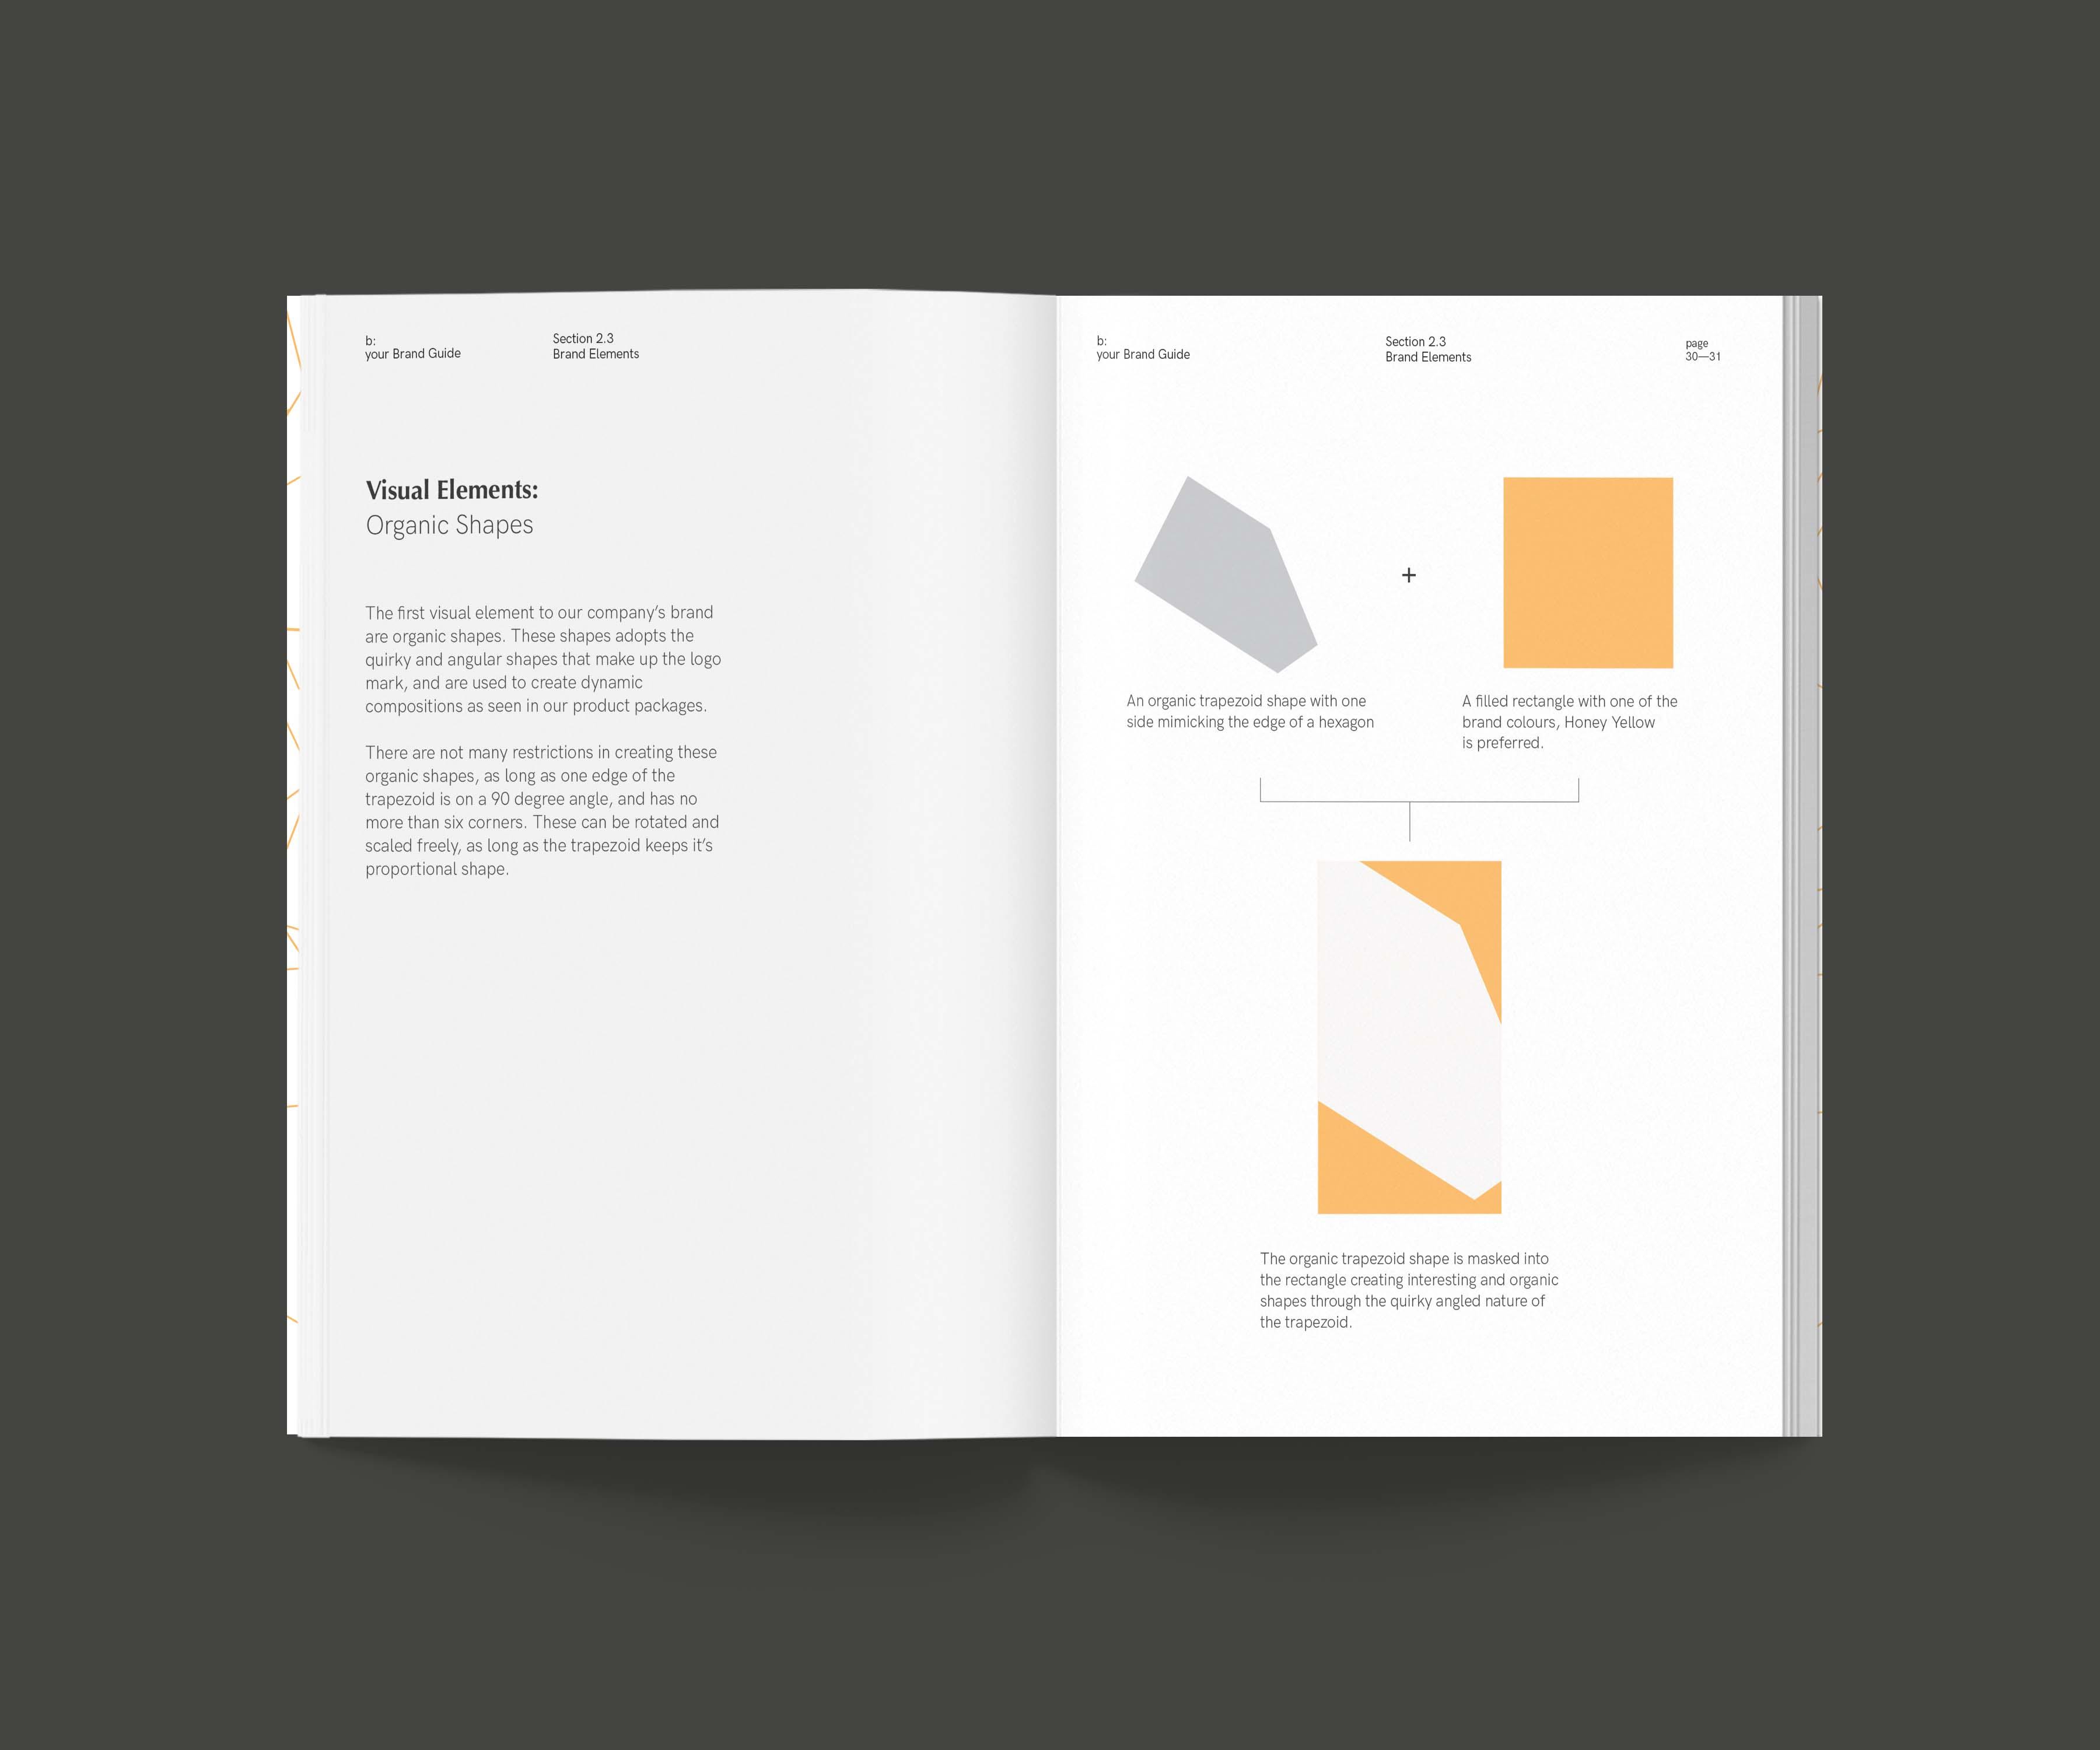 b_brandbook-visual